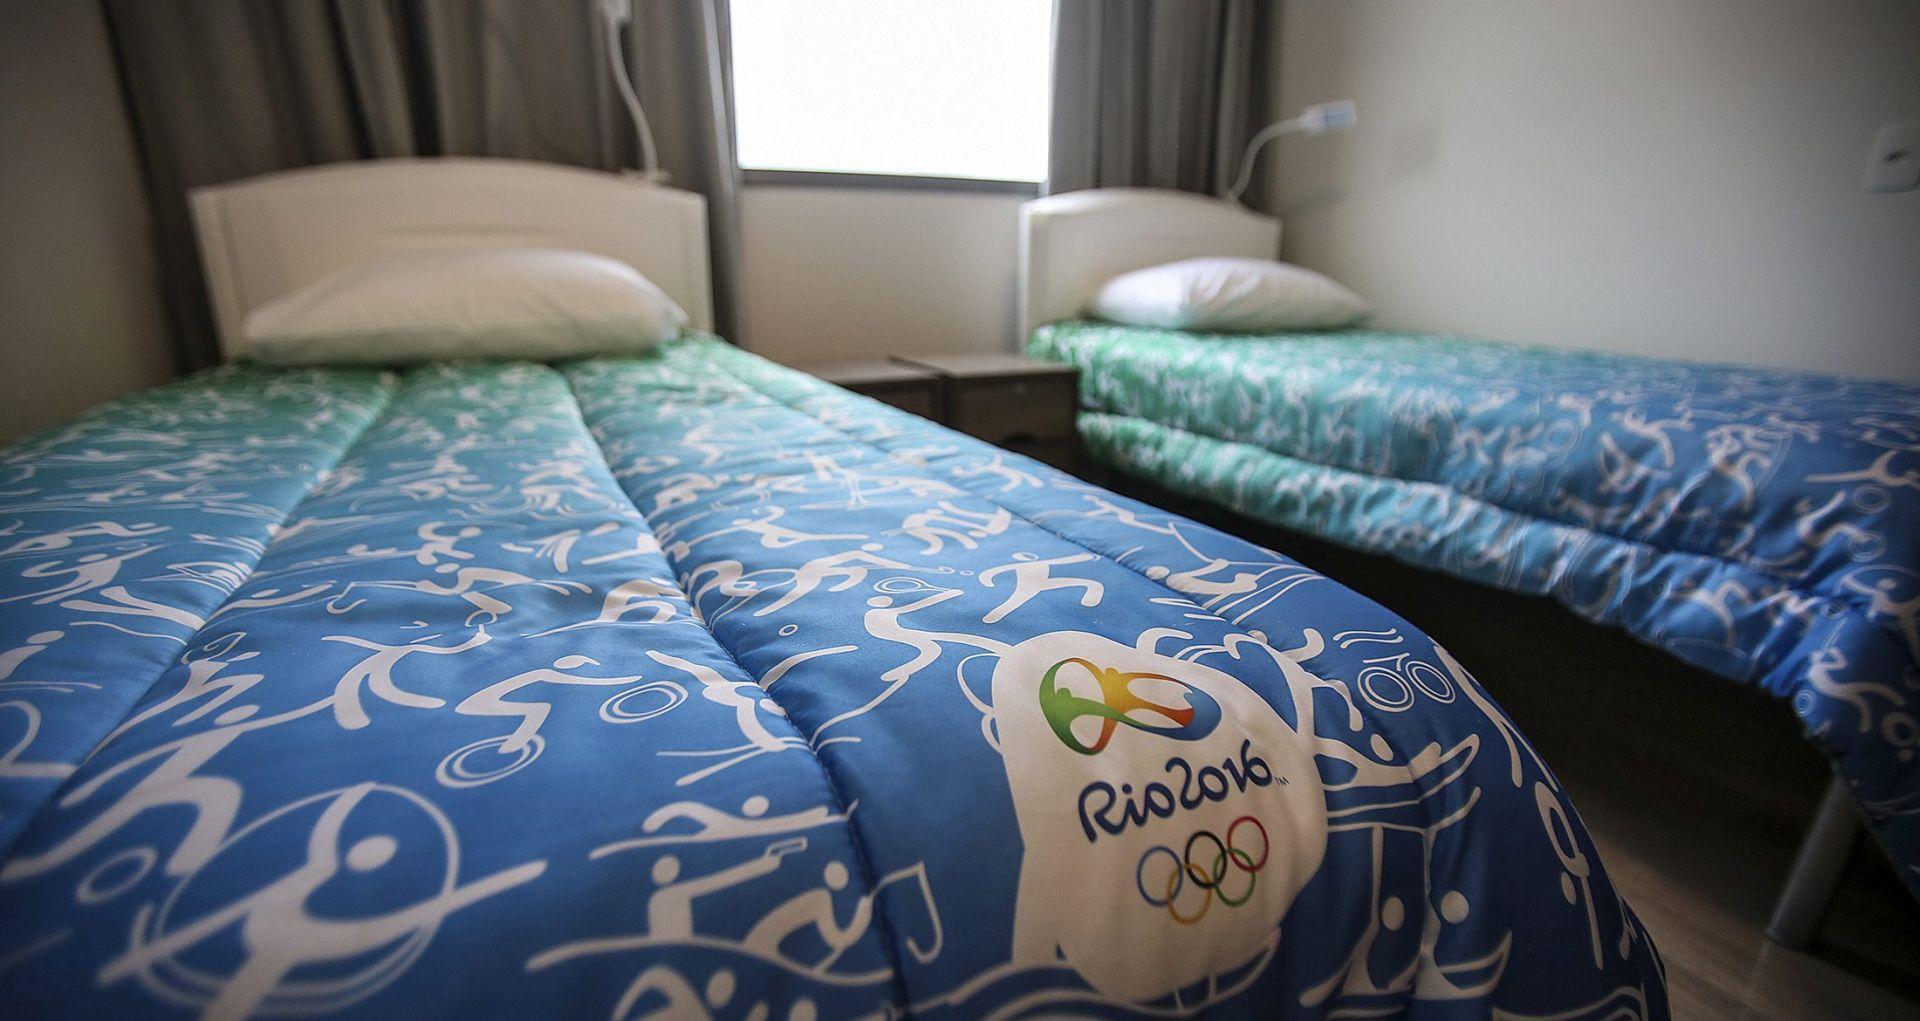 Australci ne žele u olimpijsko selo, spavat će po hotelima